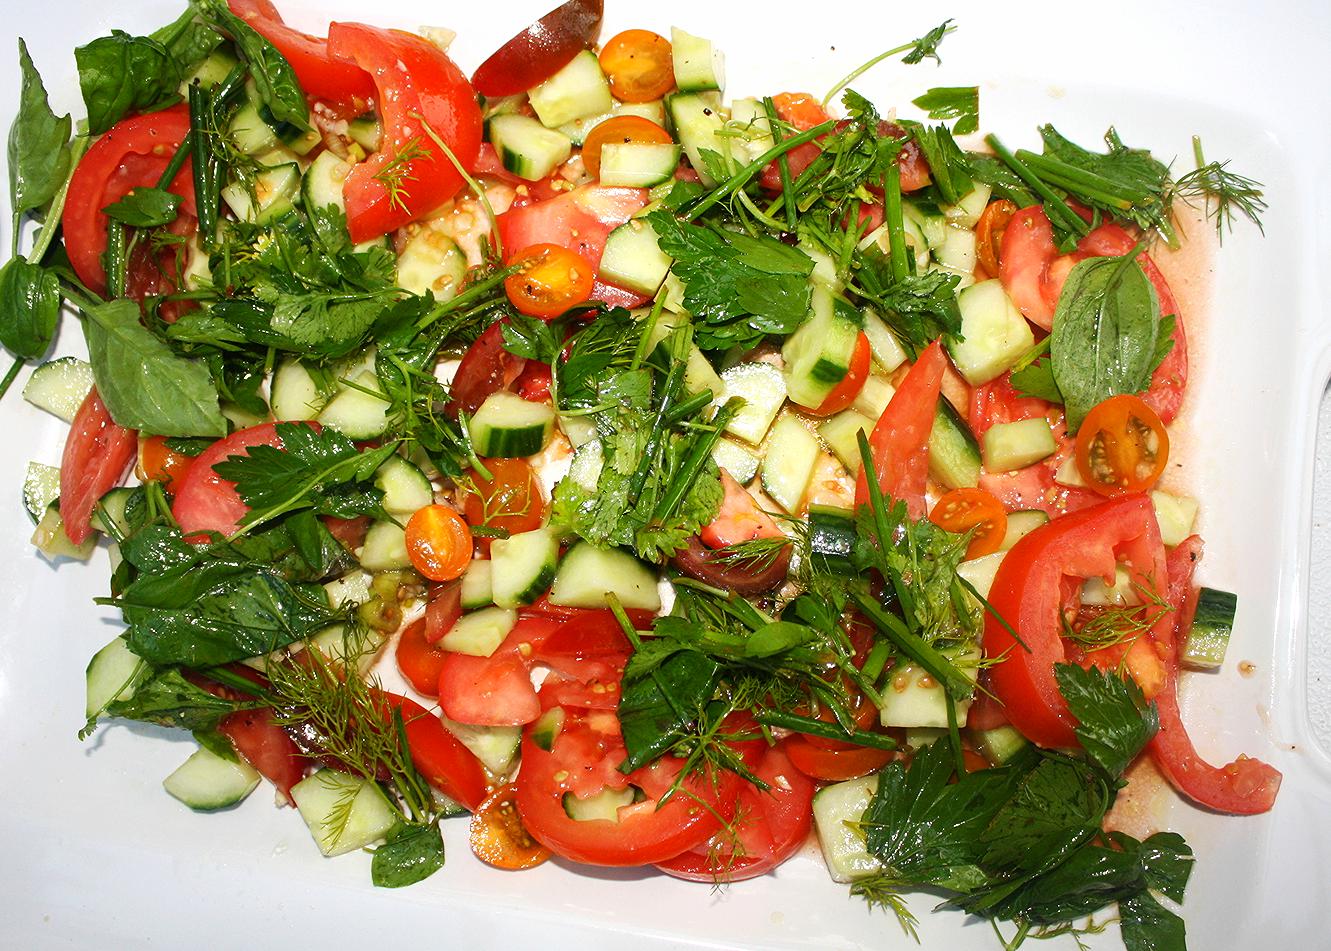 Least photogenic salad award goes to....